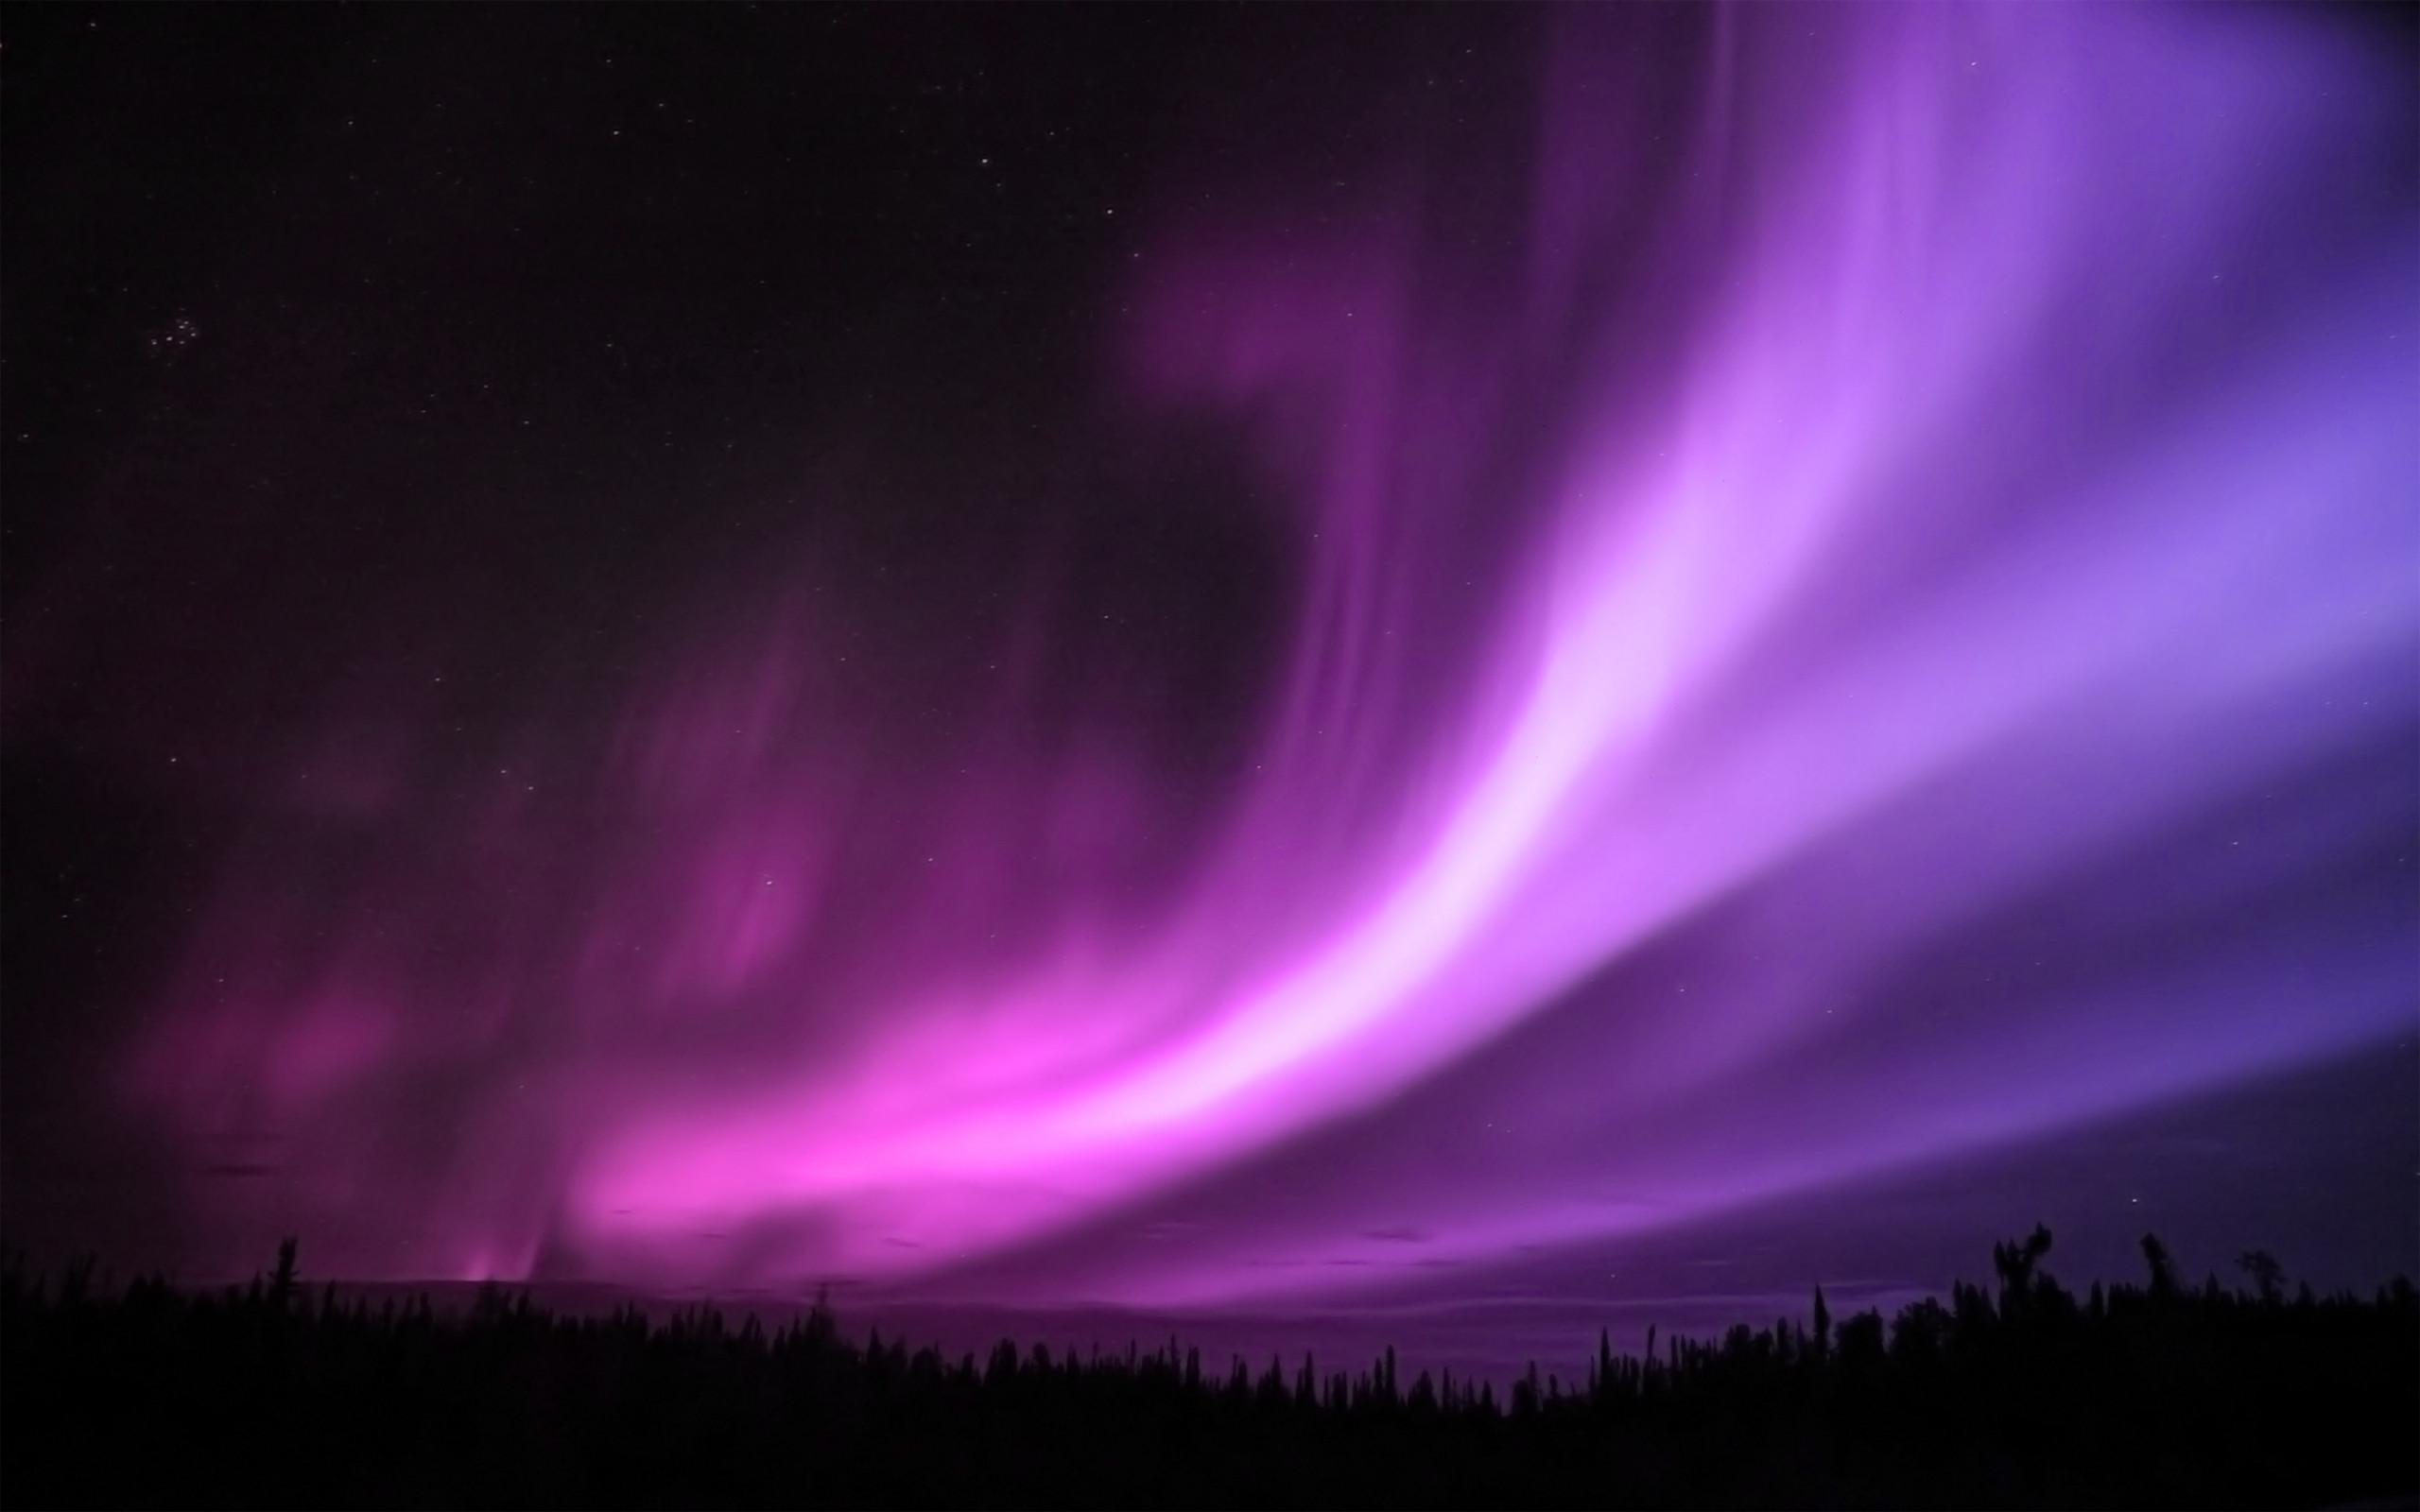 Blue And Purple Aurora Borealis